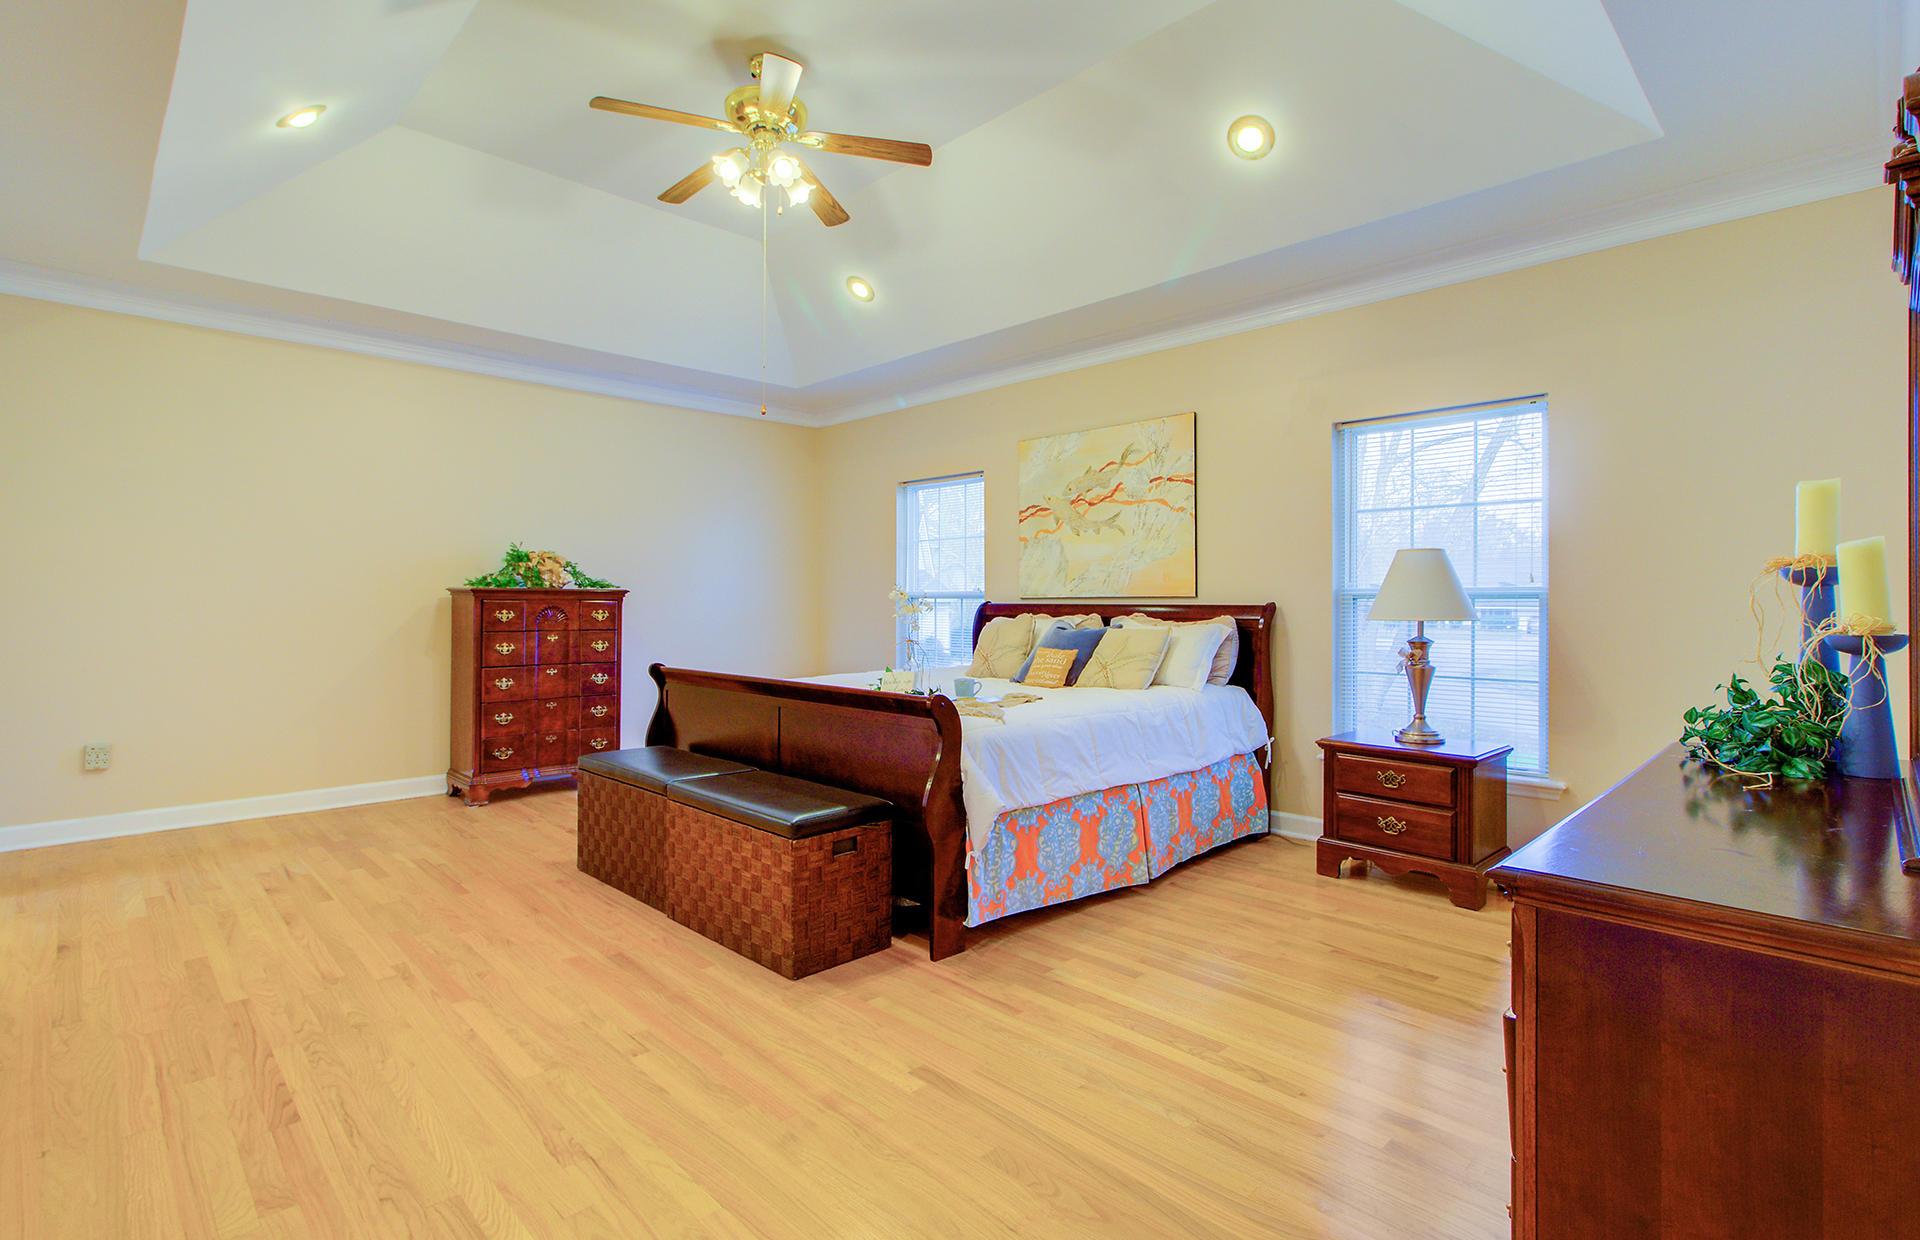 Bakers Landing Homes For Sale - 105 River Oak, North Charleston, SC - 42